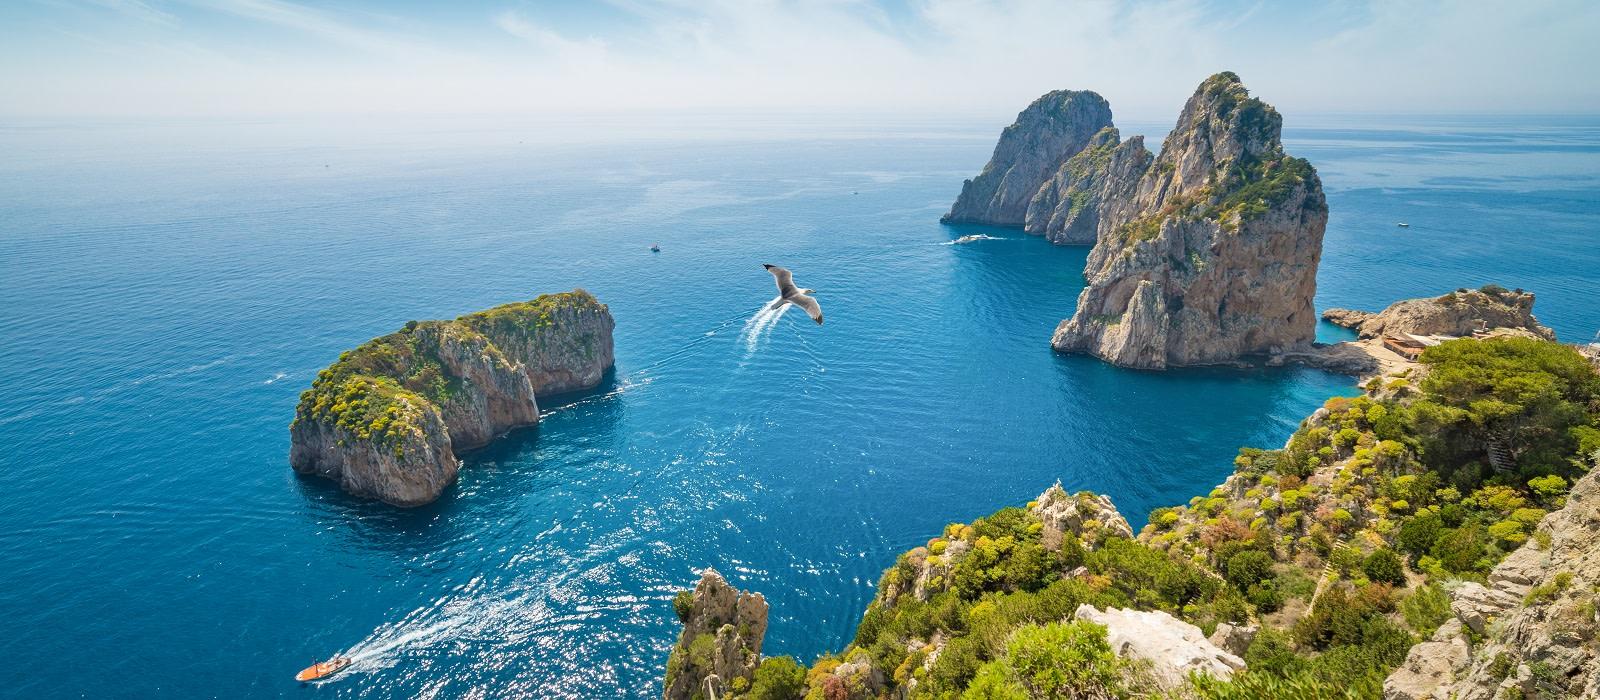 Southern Culture and the Amalfi Coast Tour Trip 1